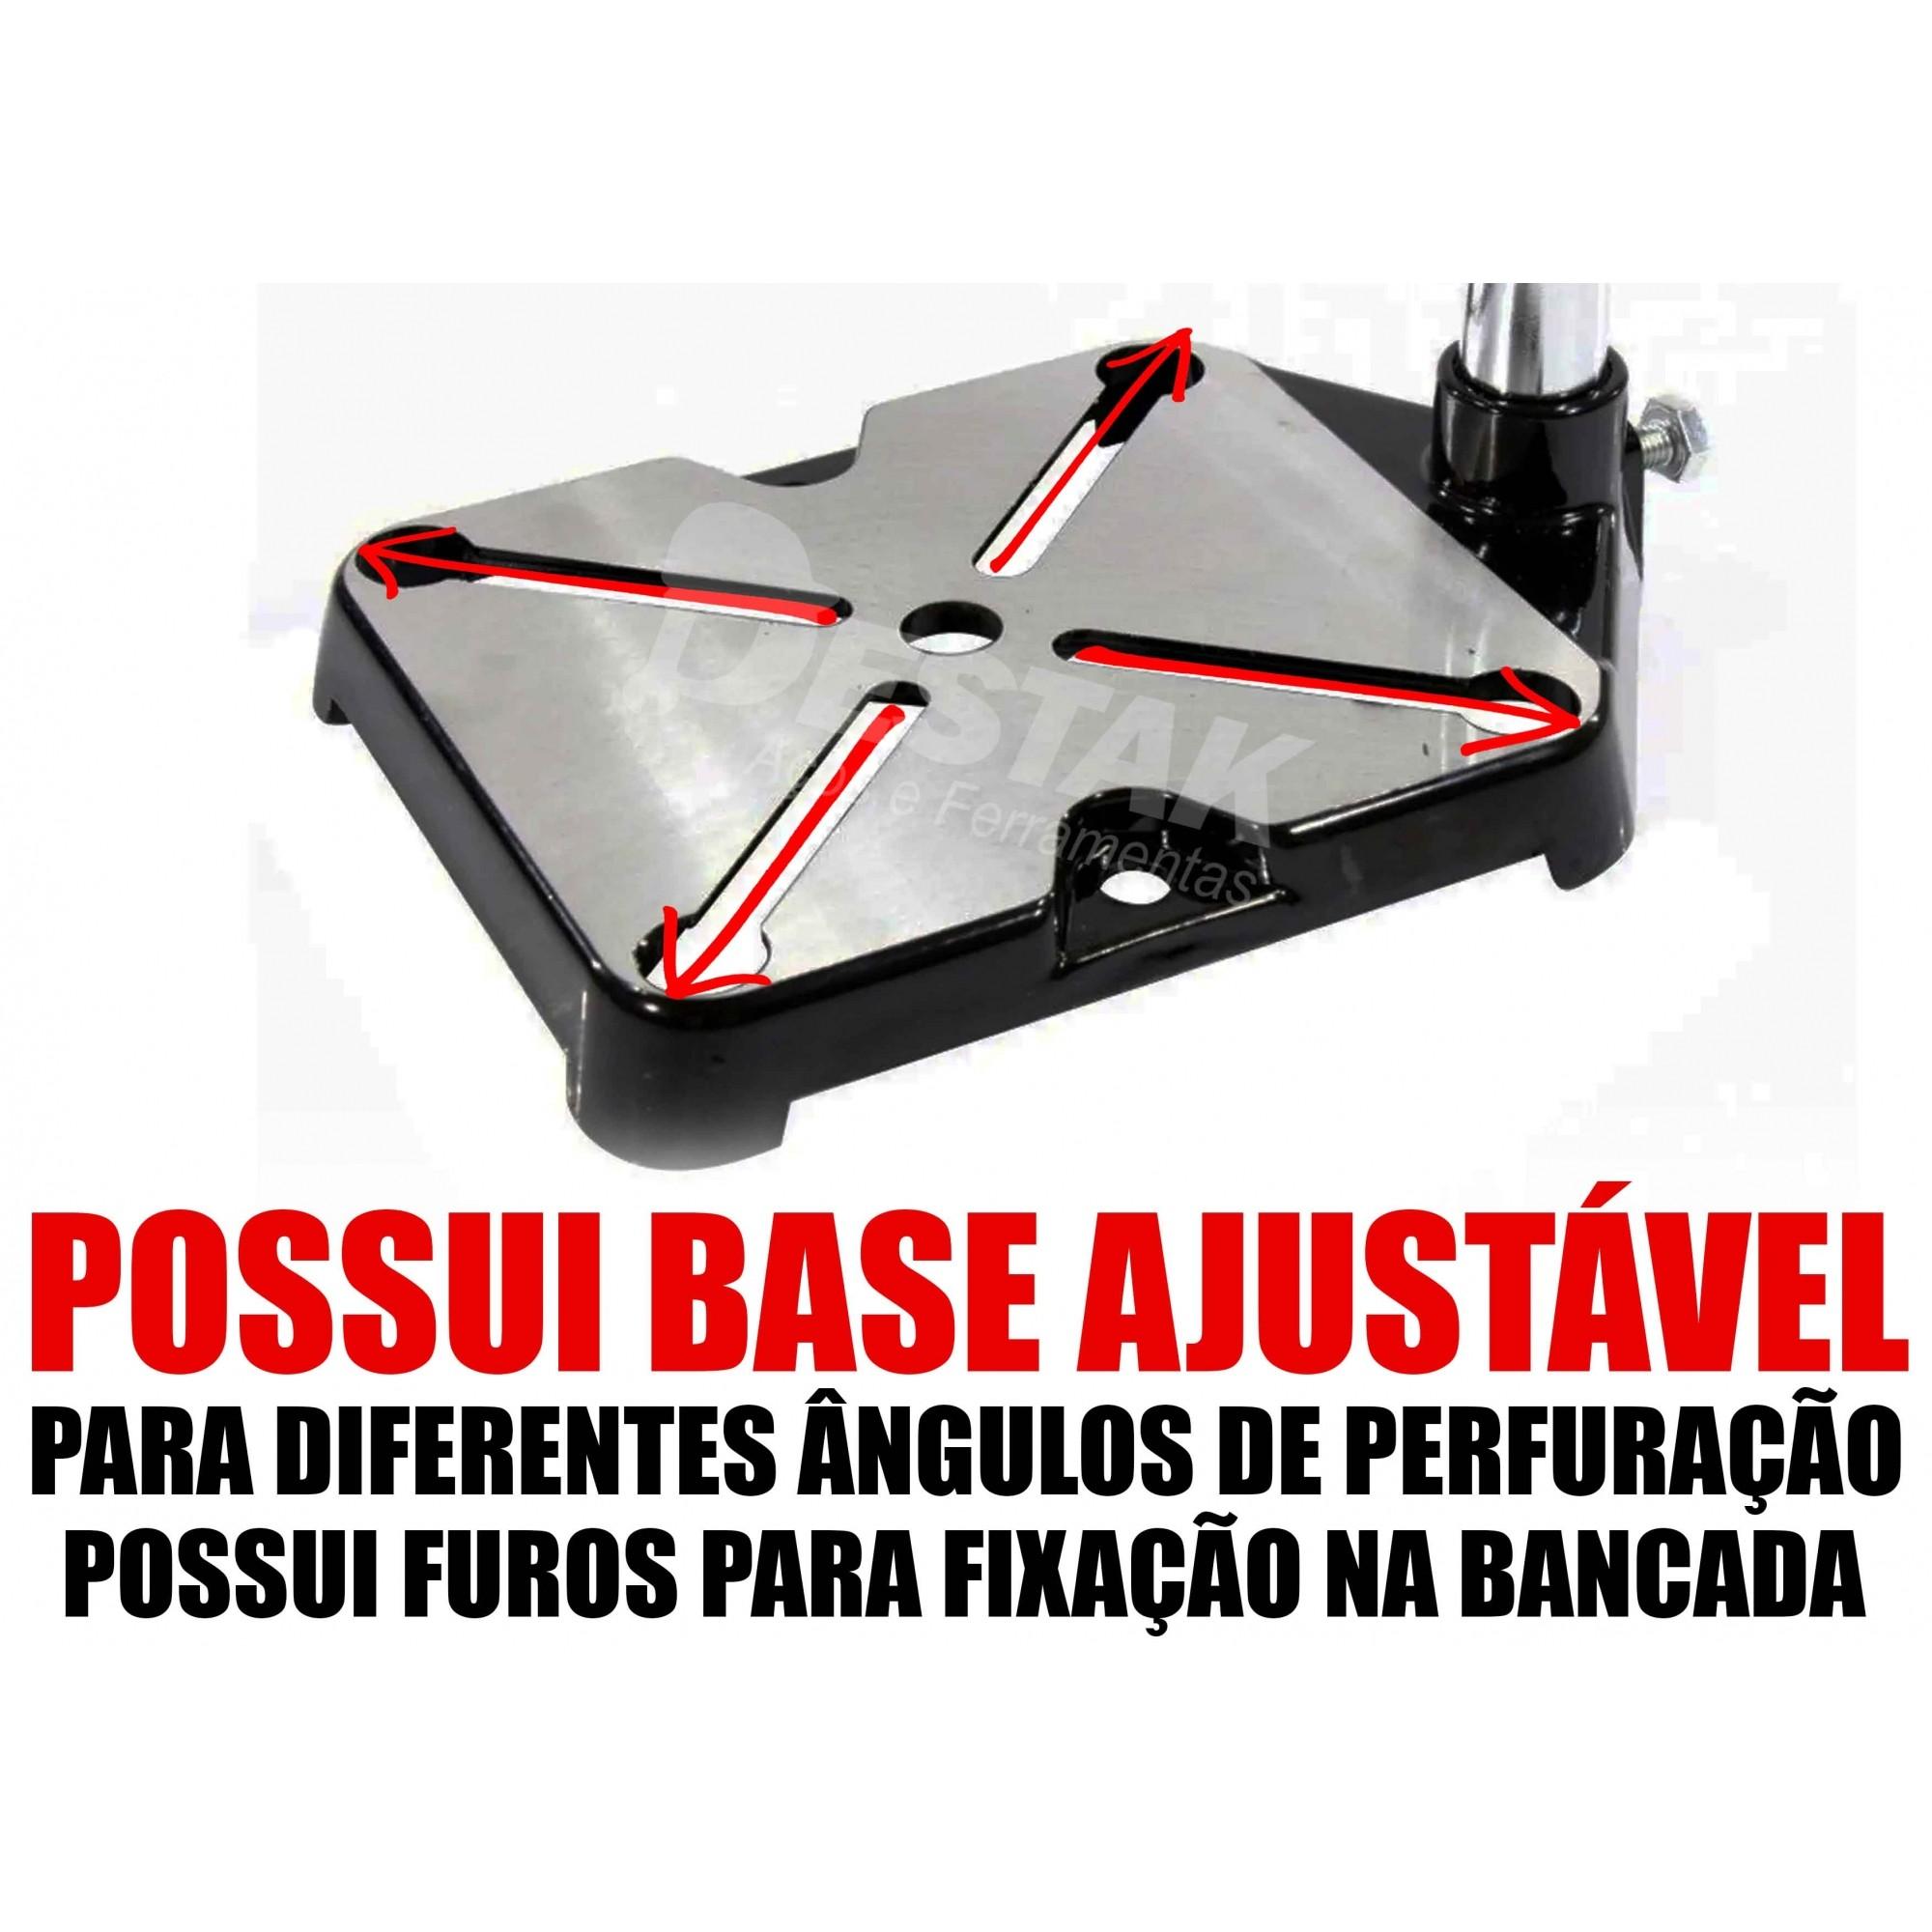 Kit Suporte Furadeira Elétrica 1/2 E 3/8 Morsa Brocas Maleta